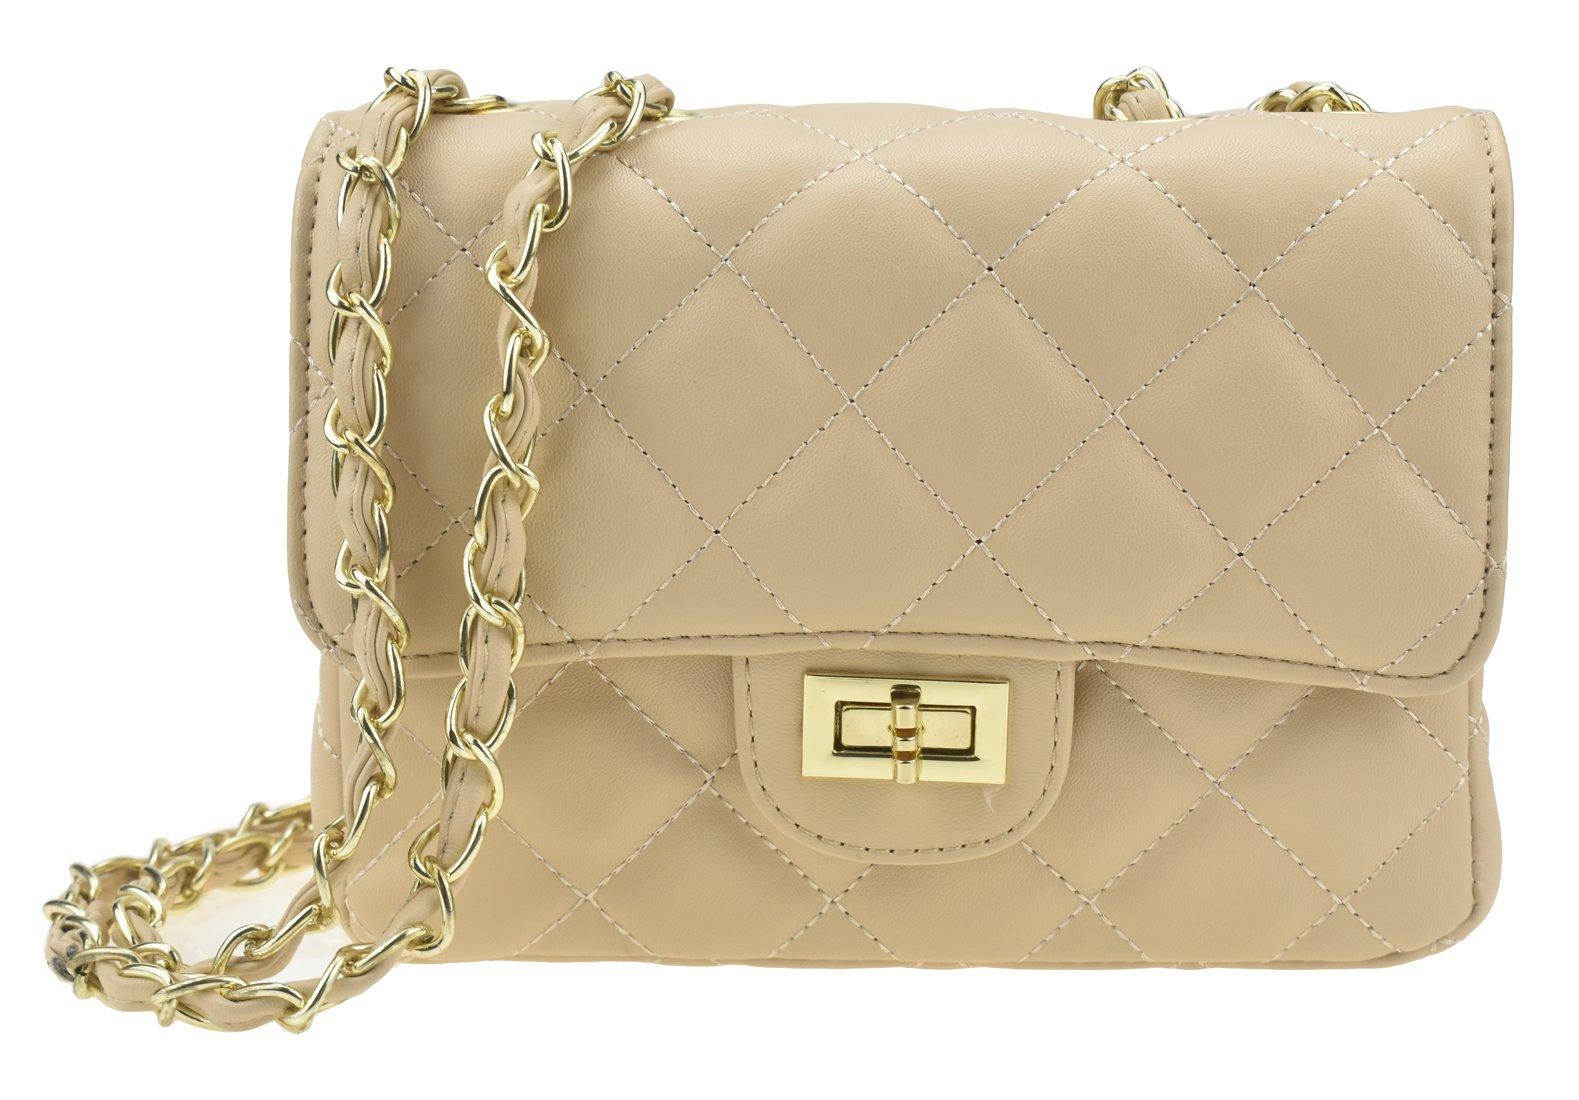 Covelin Women's Leather Fashion Handbag Quilting Envelope Cross Body Shoulder Bag Apricot